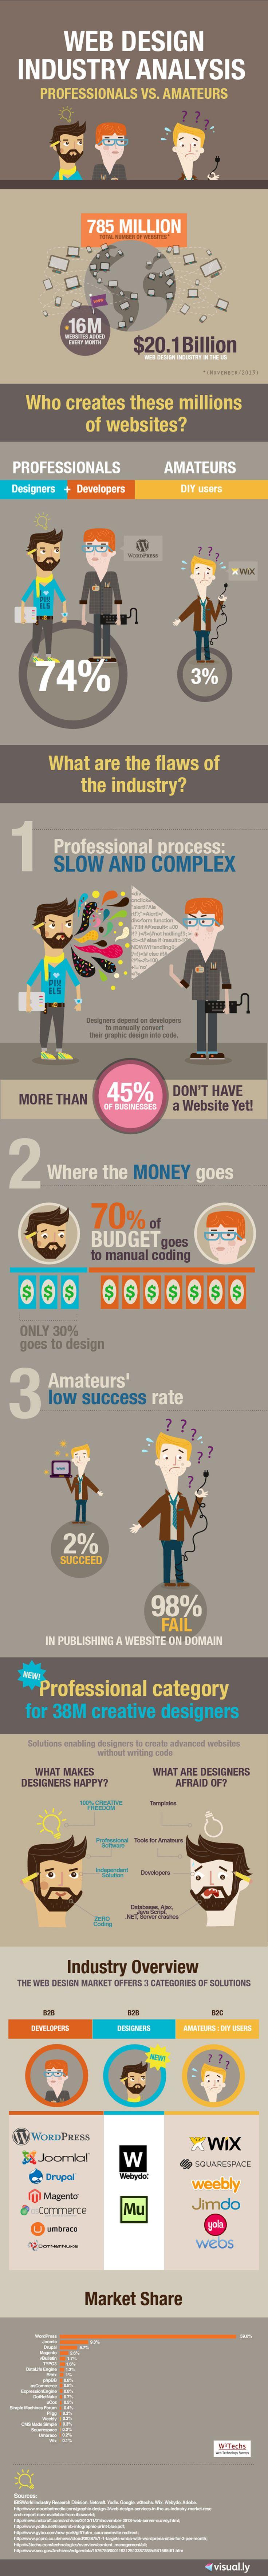 Professional web designers vs. amateur users